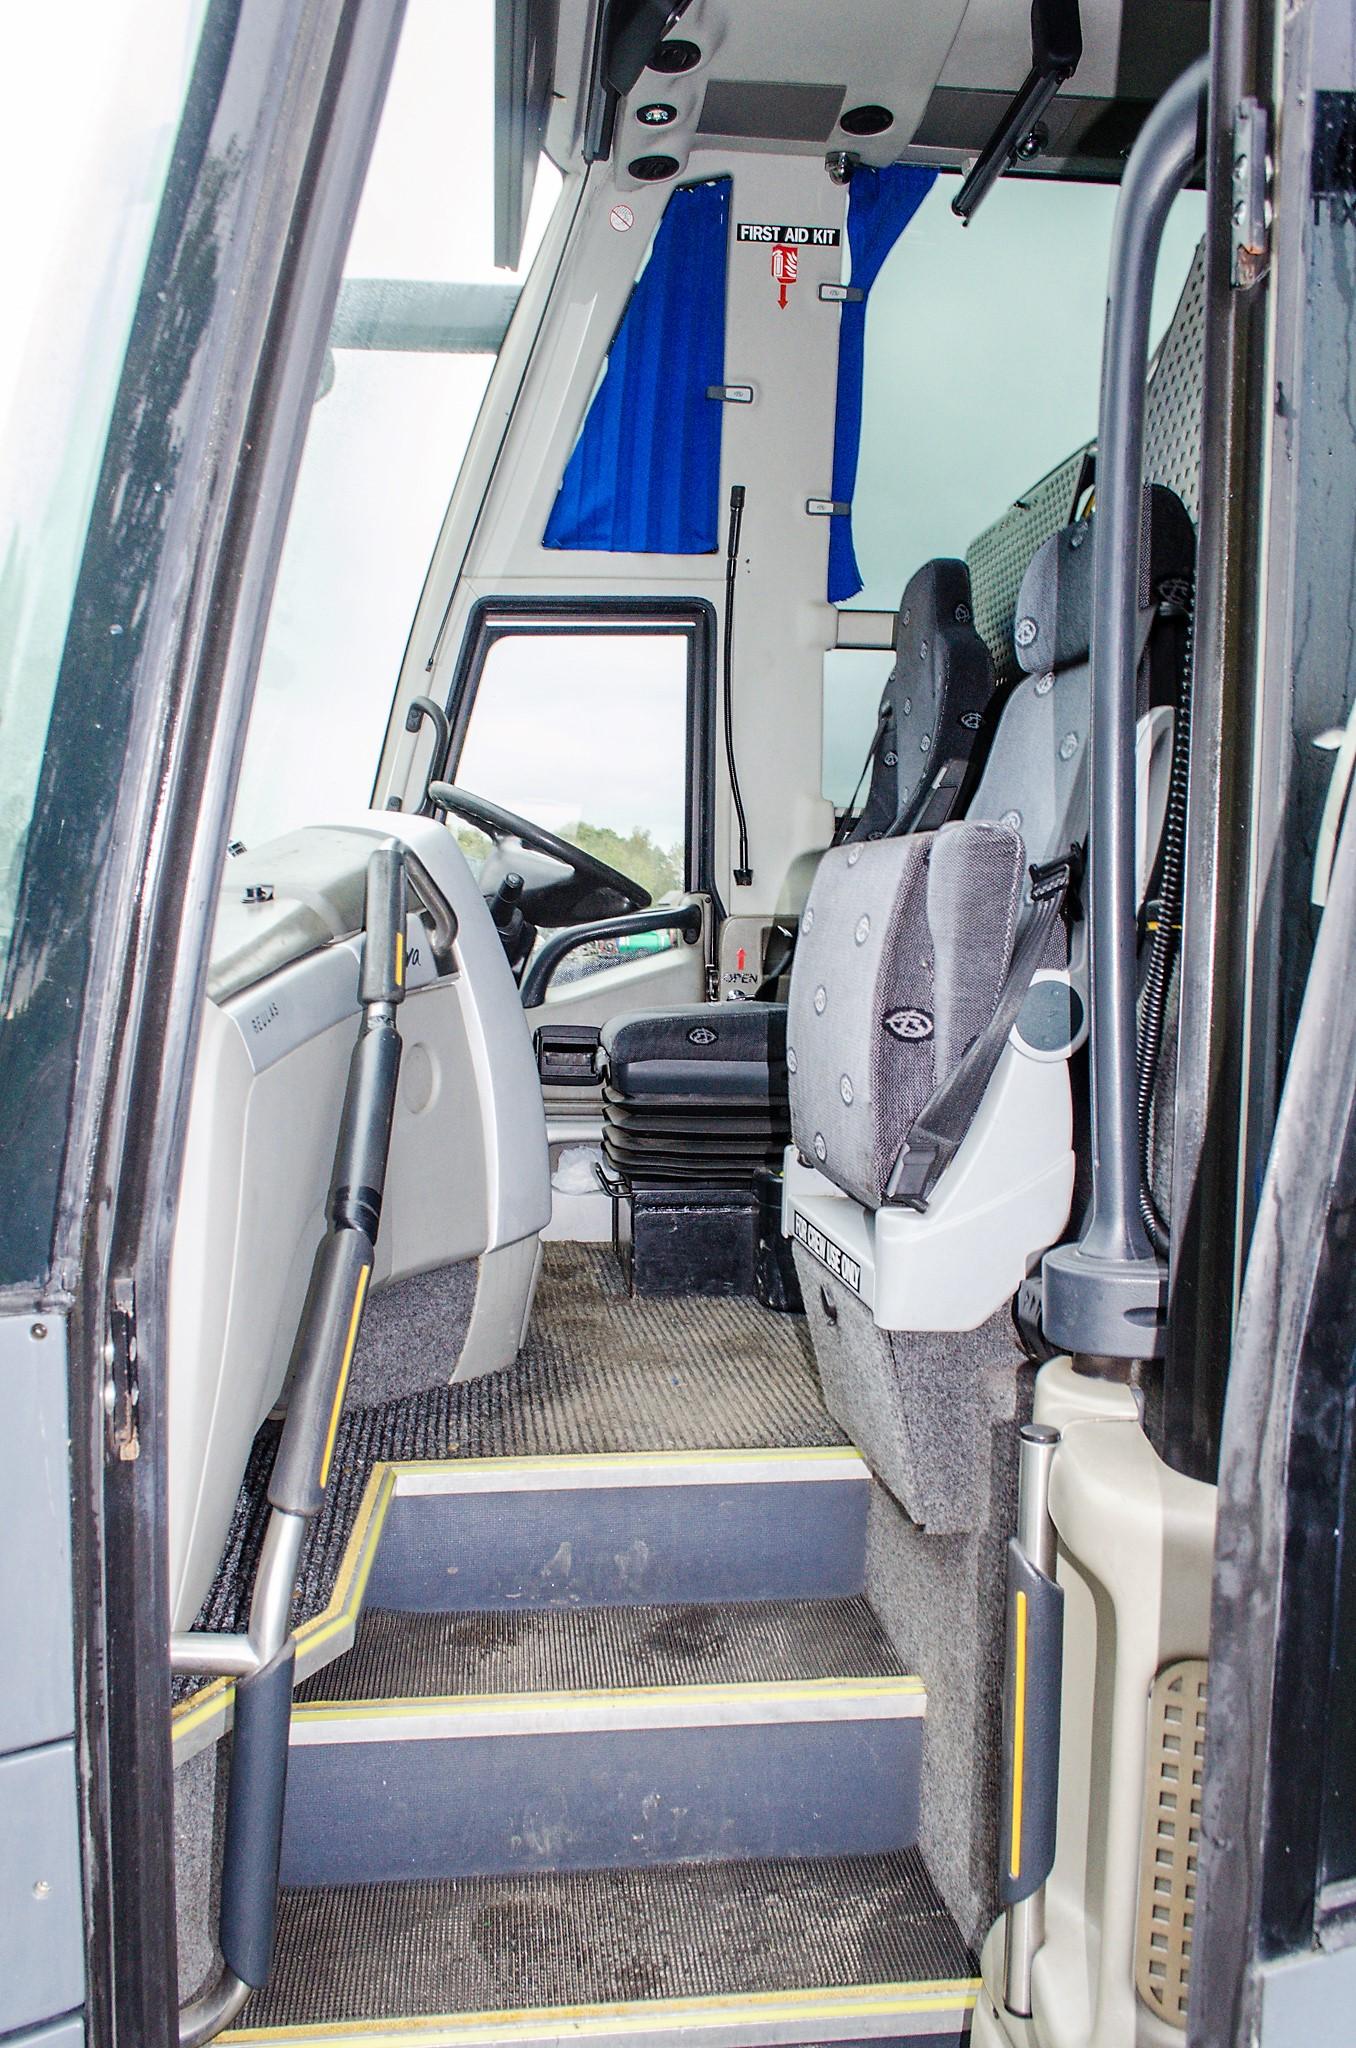 MAN F2000 Beulas Aura 54 seat luxury coach Registration Number: KC08 KTC Date of Registration: 30/ - Image 13 of 19